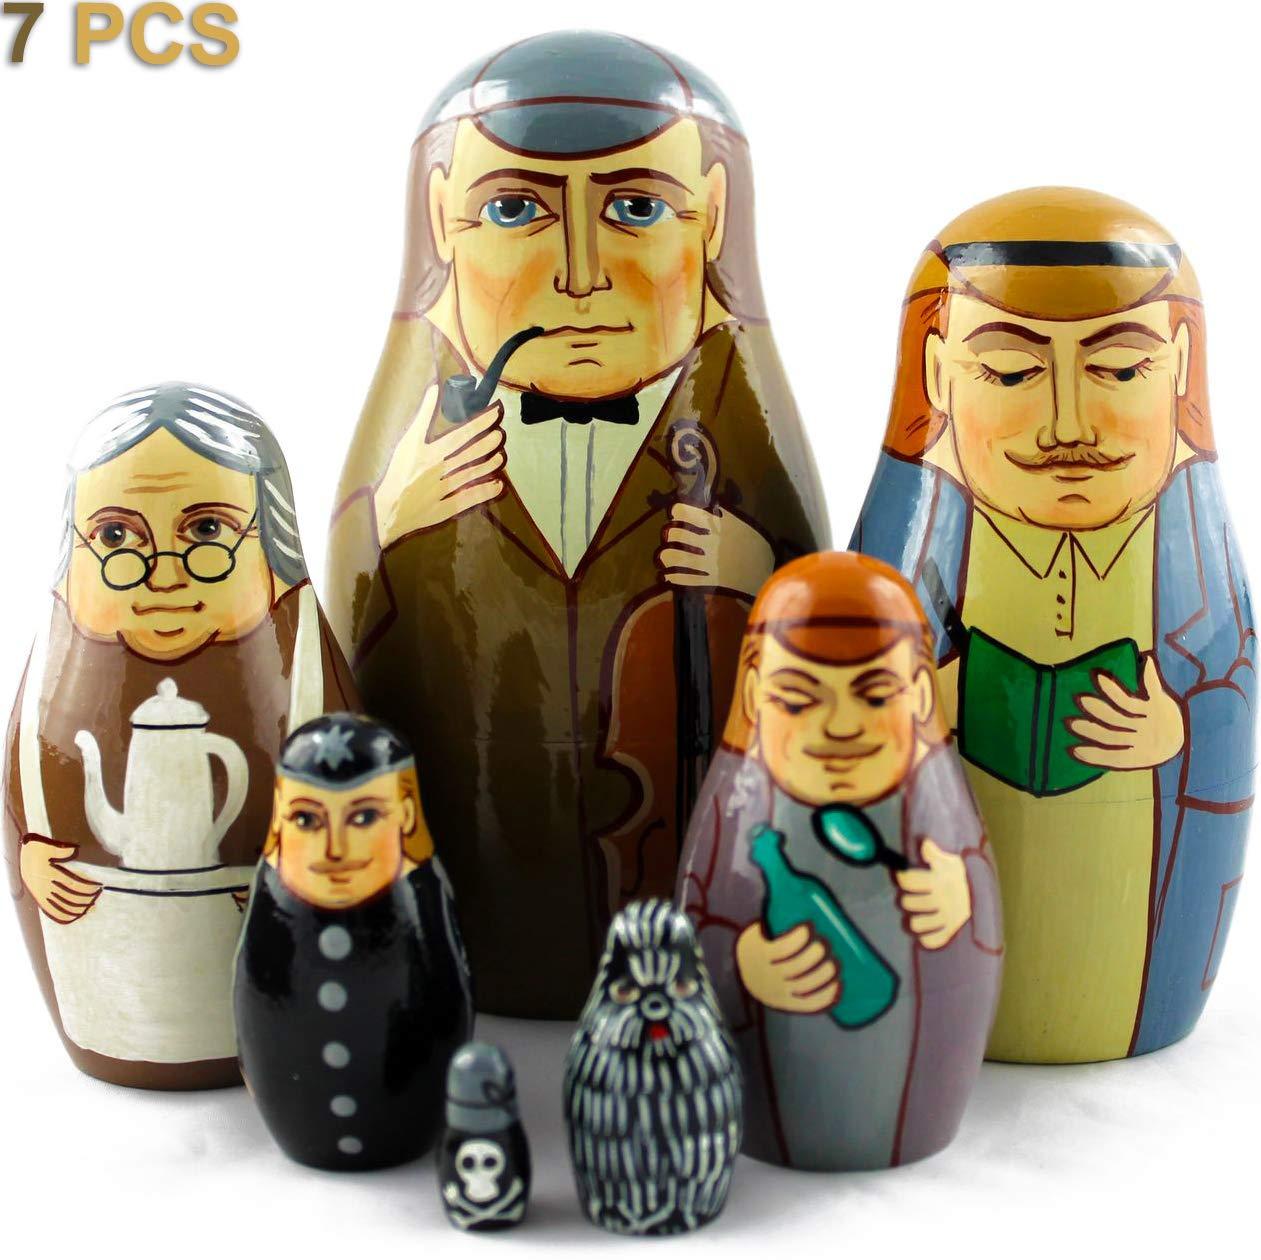 Matryoshka Russian Nesting Dolls On The Motives Stories of Sherlock Holmes 7 pcs Wooden Figurines by MATRYOSHKA&HANDICRAFT